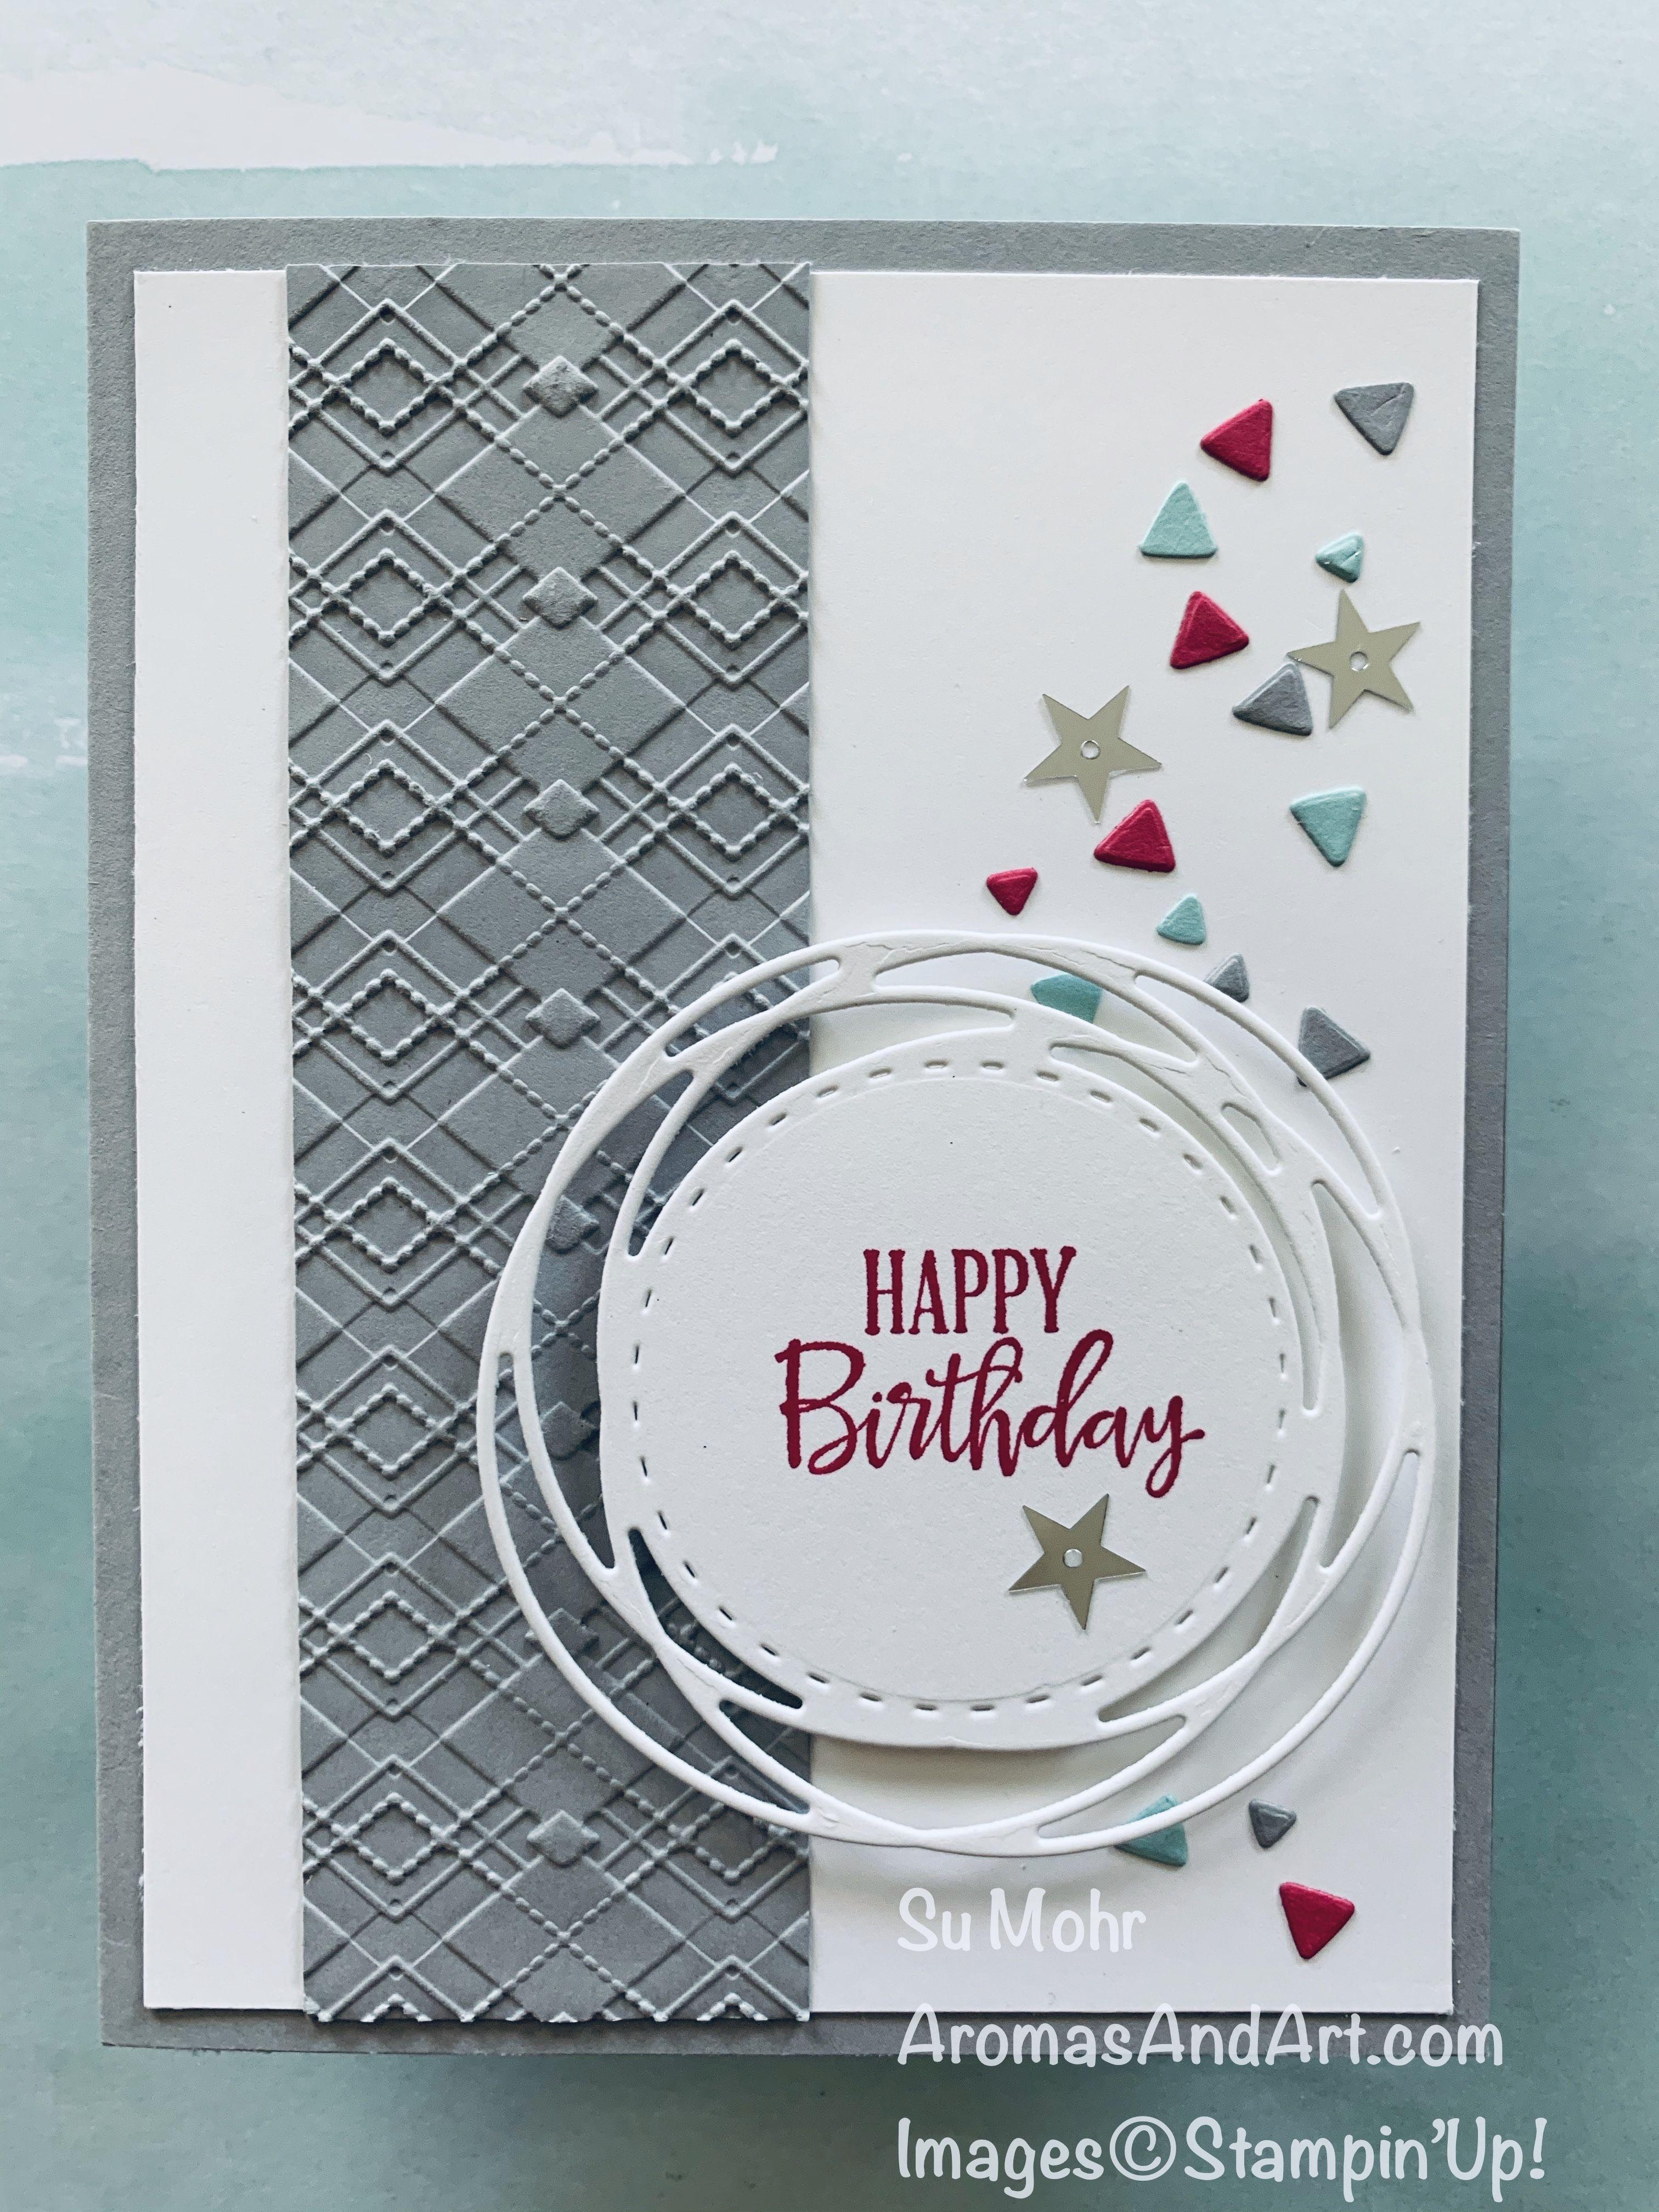 Masculine Argyle Birthday Card - Aromas and Art